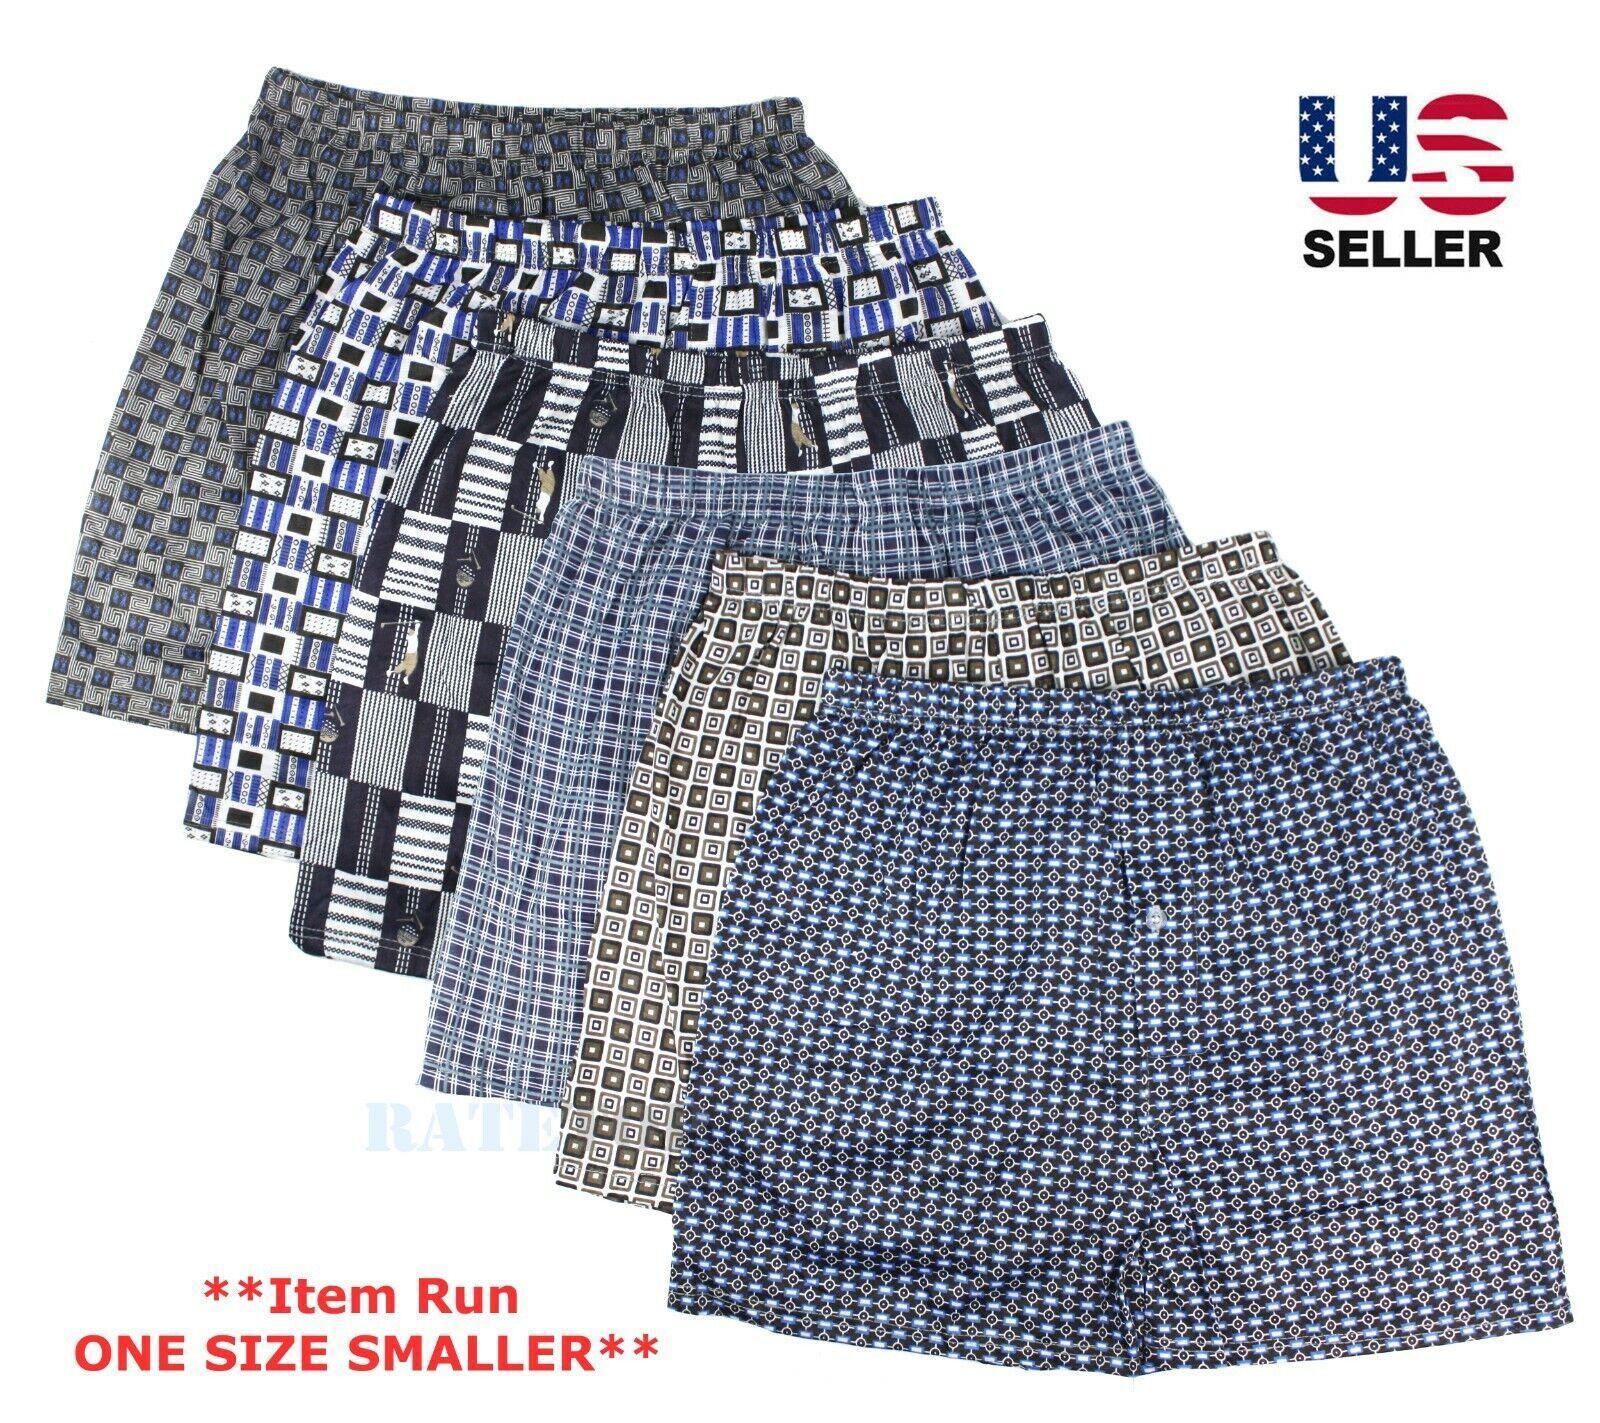 Lot 3-Pack Mens Cotton Boxer Briefs Underwear Shorts Trunks